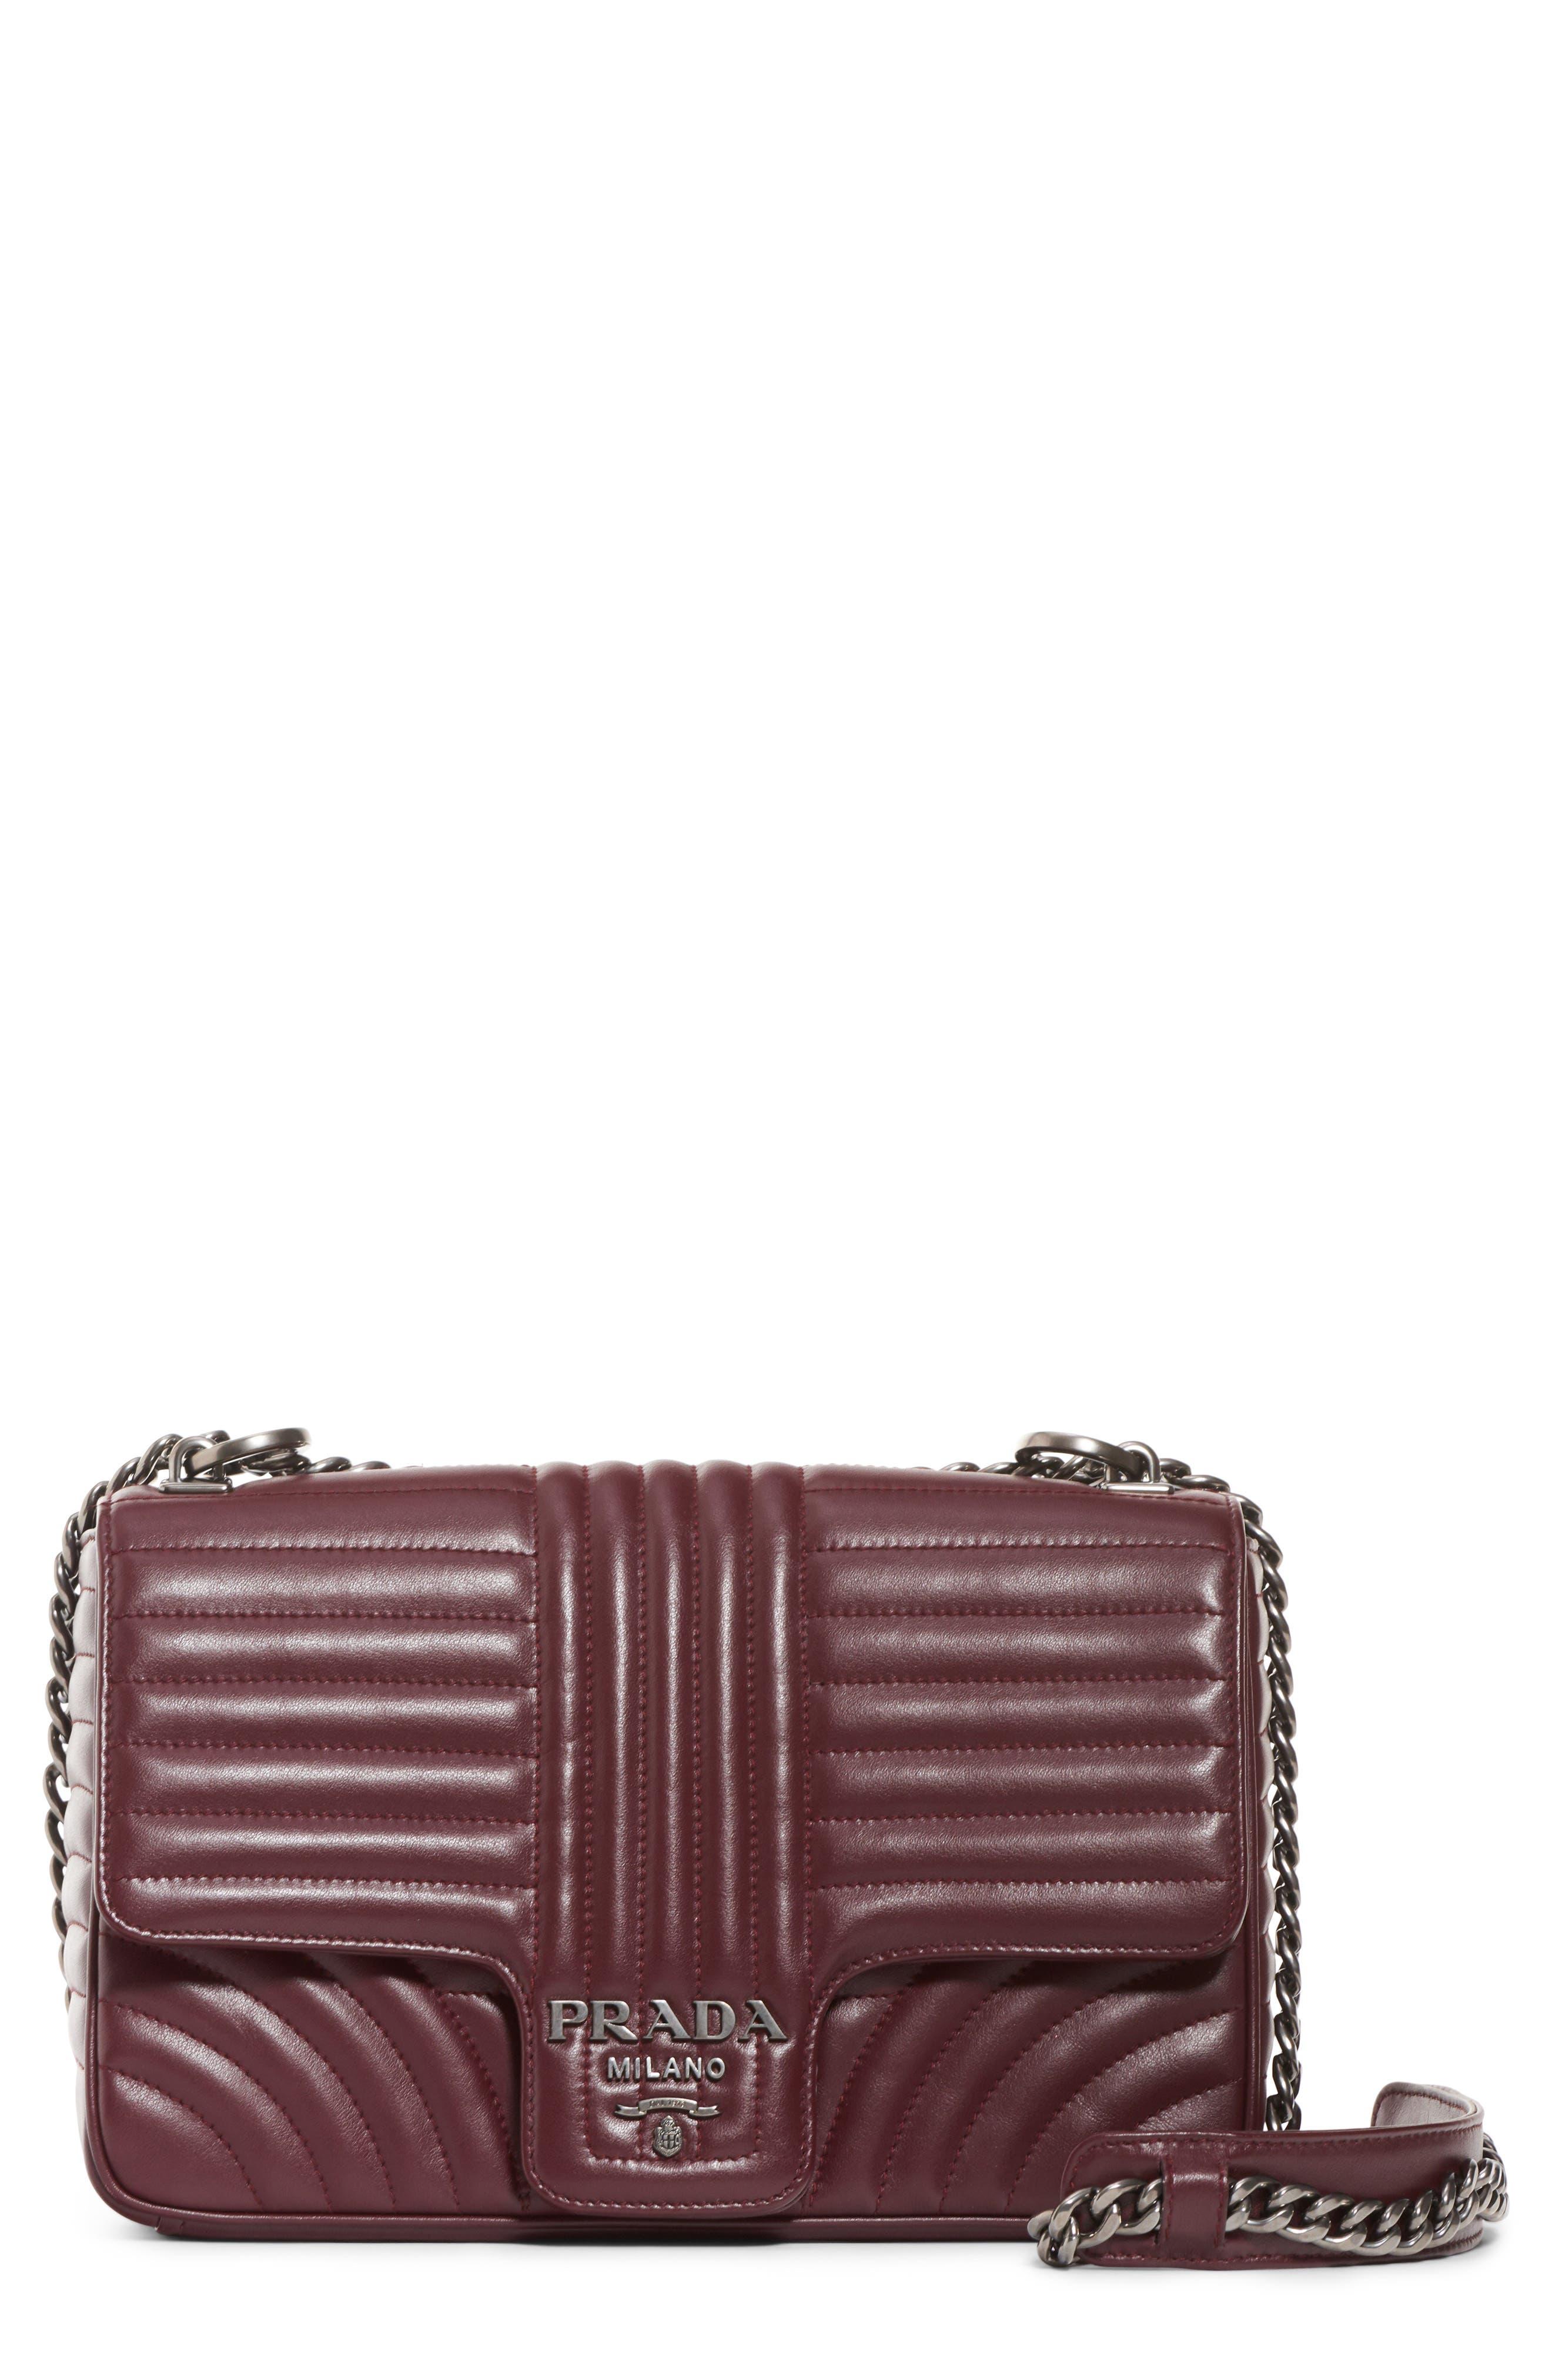 1cbc0941bab3 Prada Crossbody Bags | Nordstrom